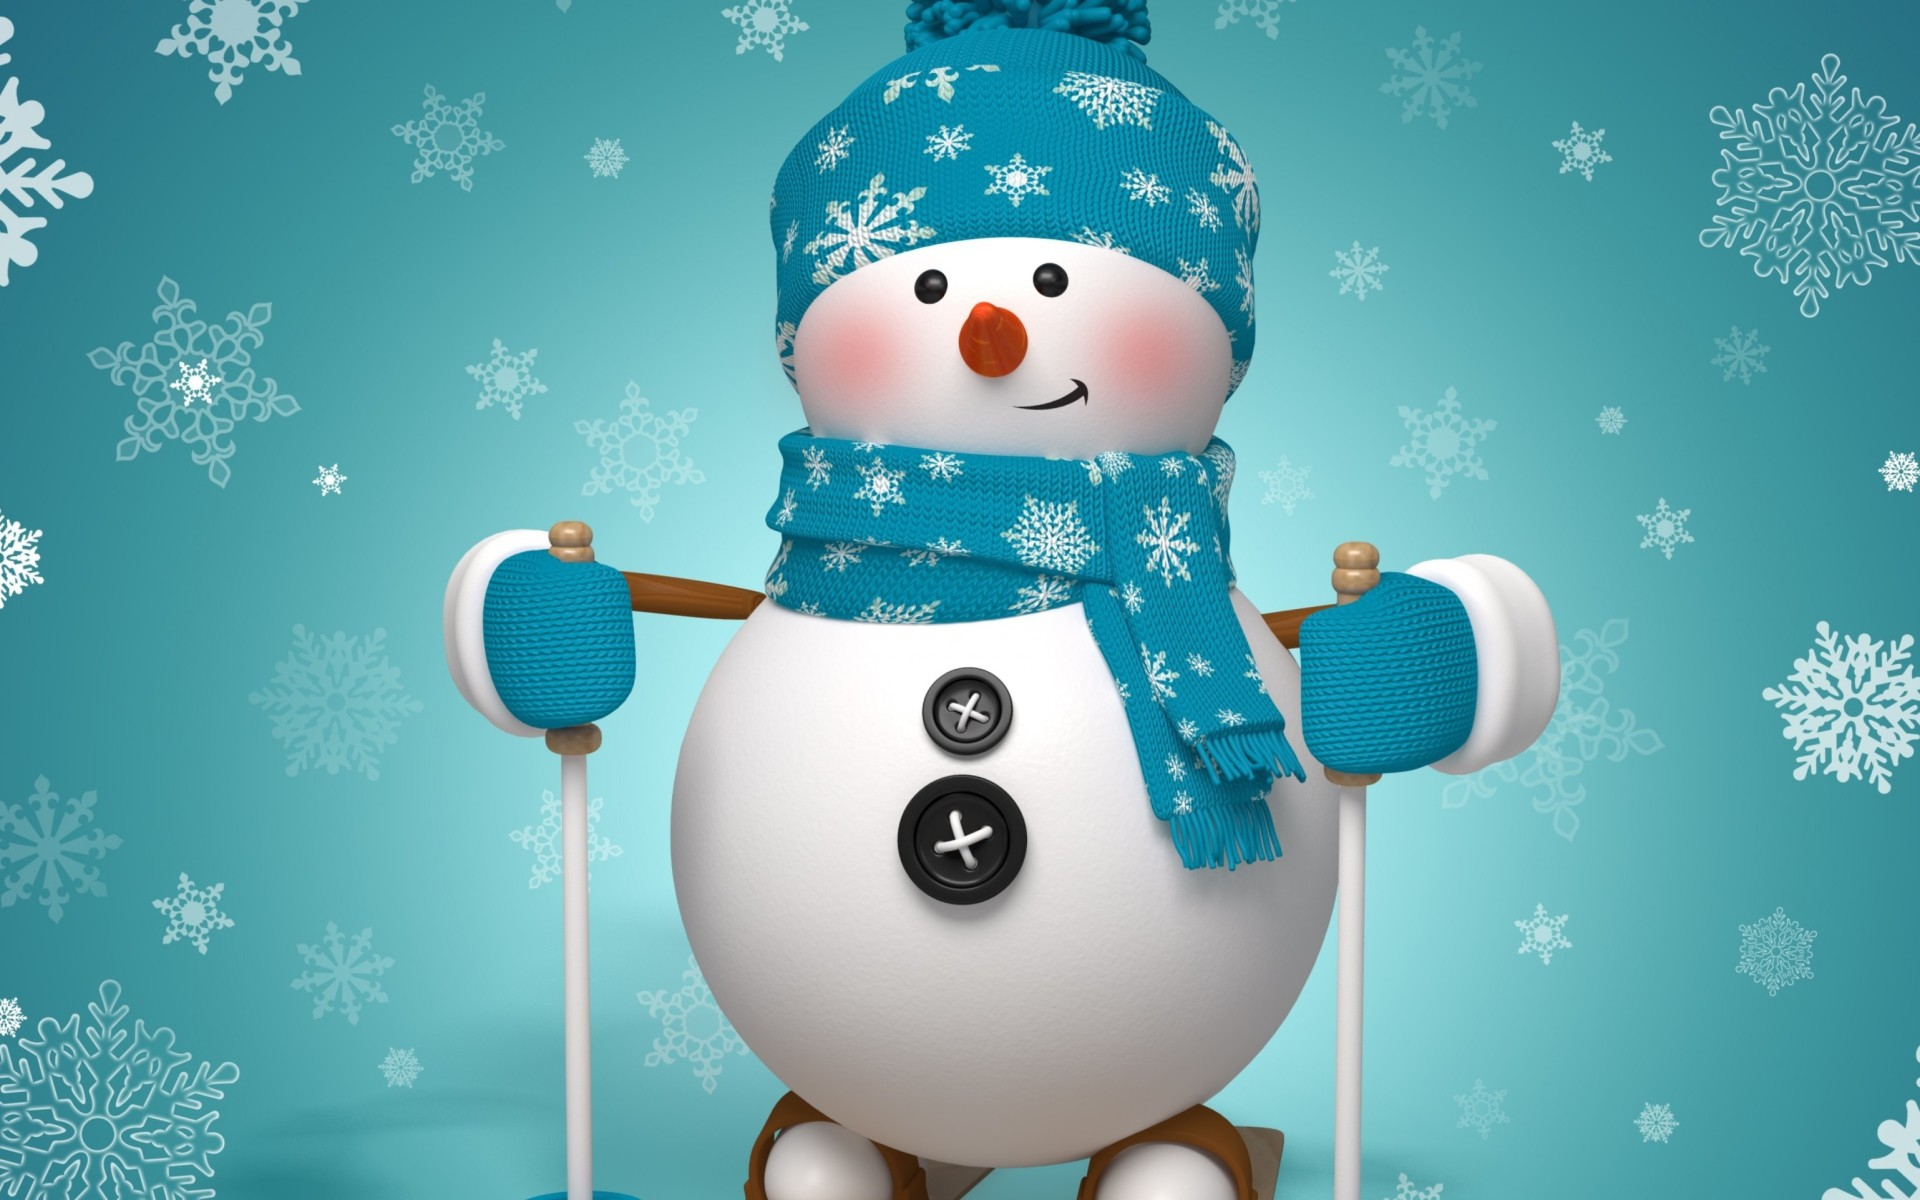 Frosty The Snowman Wallpaper 1